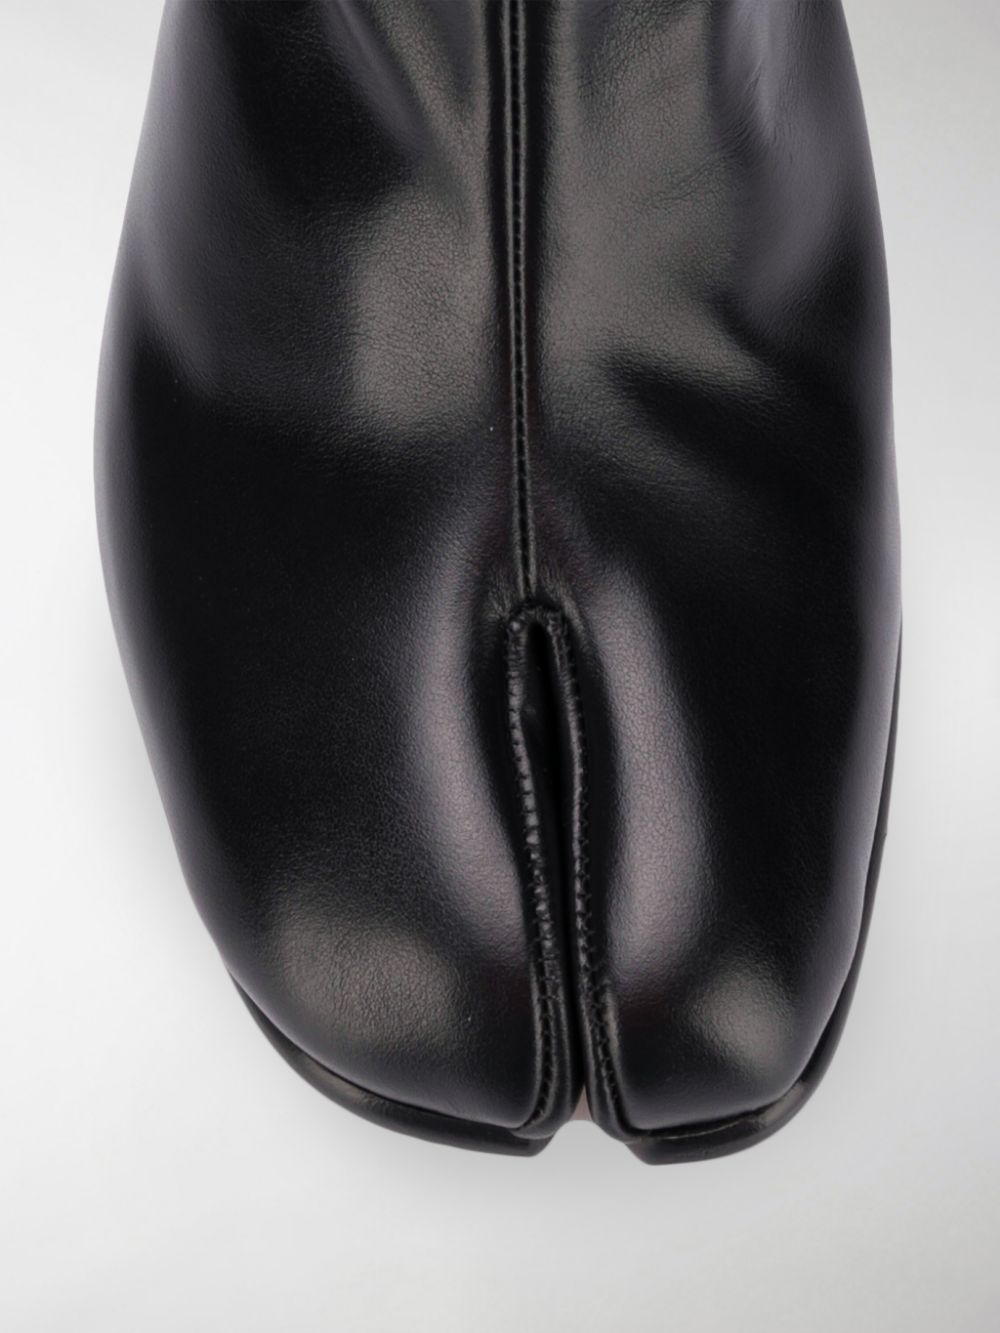 Maison Margiela stivale tabi uomo nero MAISON MARGIELA | Stivali | S57WU0132 PR516T8013